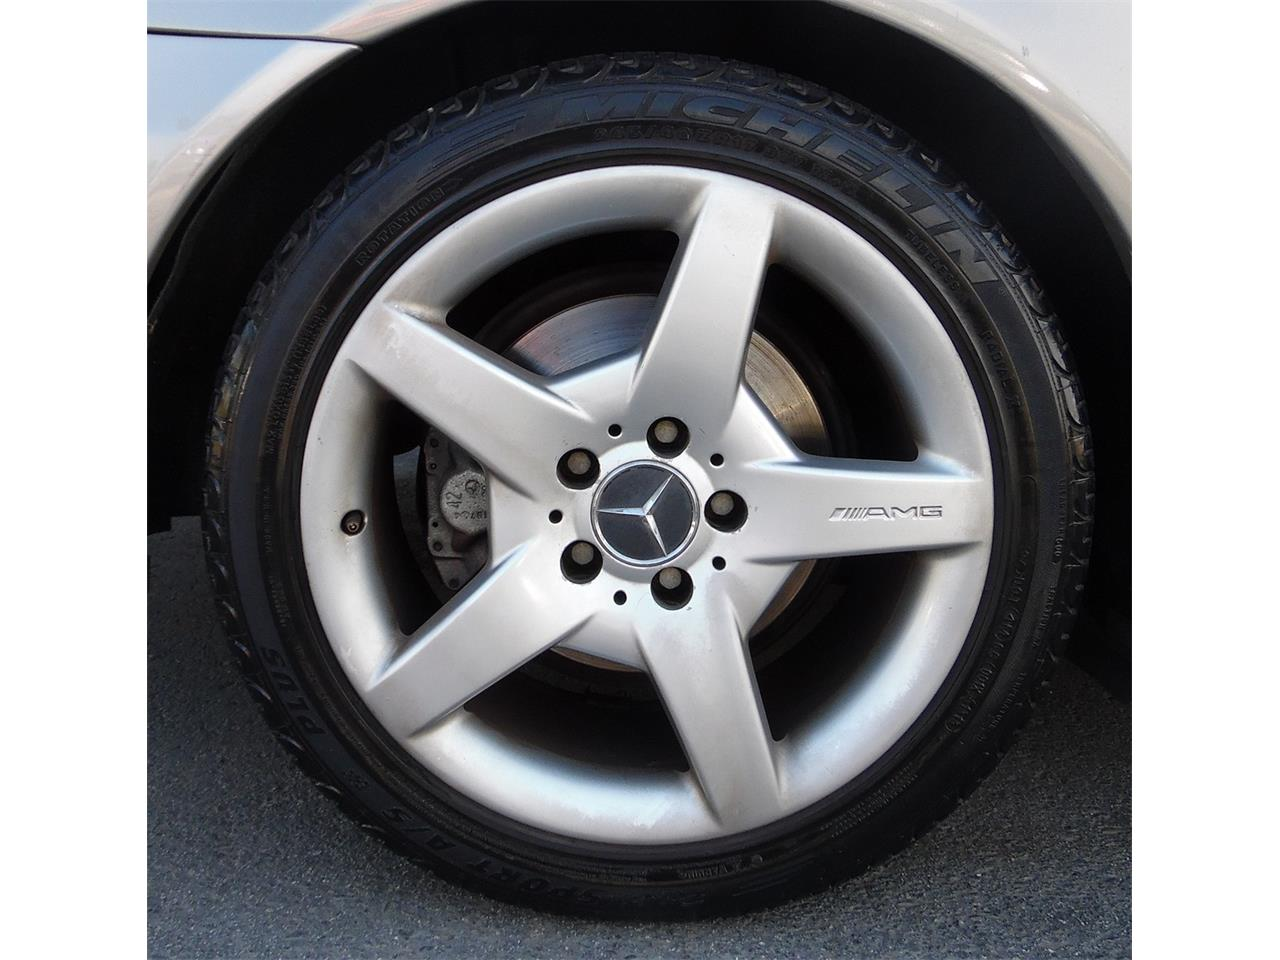 2005 Mercedes-Benz CLK500 (CC-1193664) for sale in Redlands, California